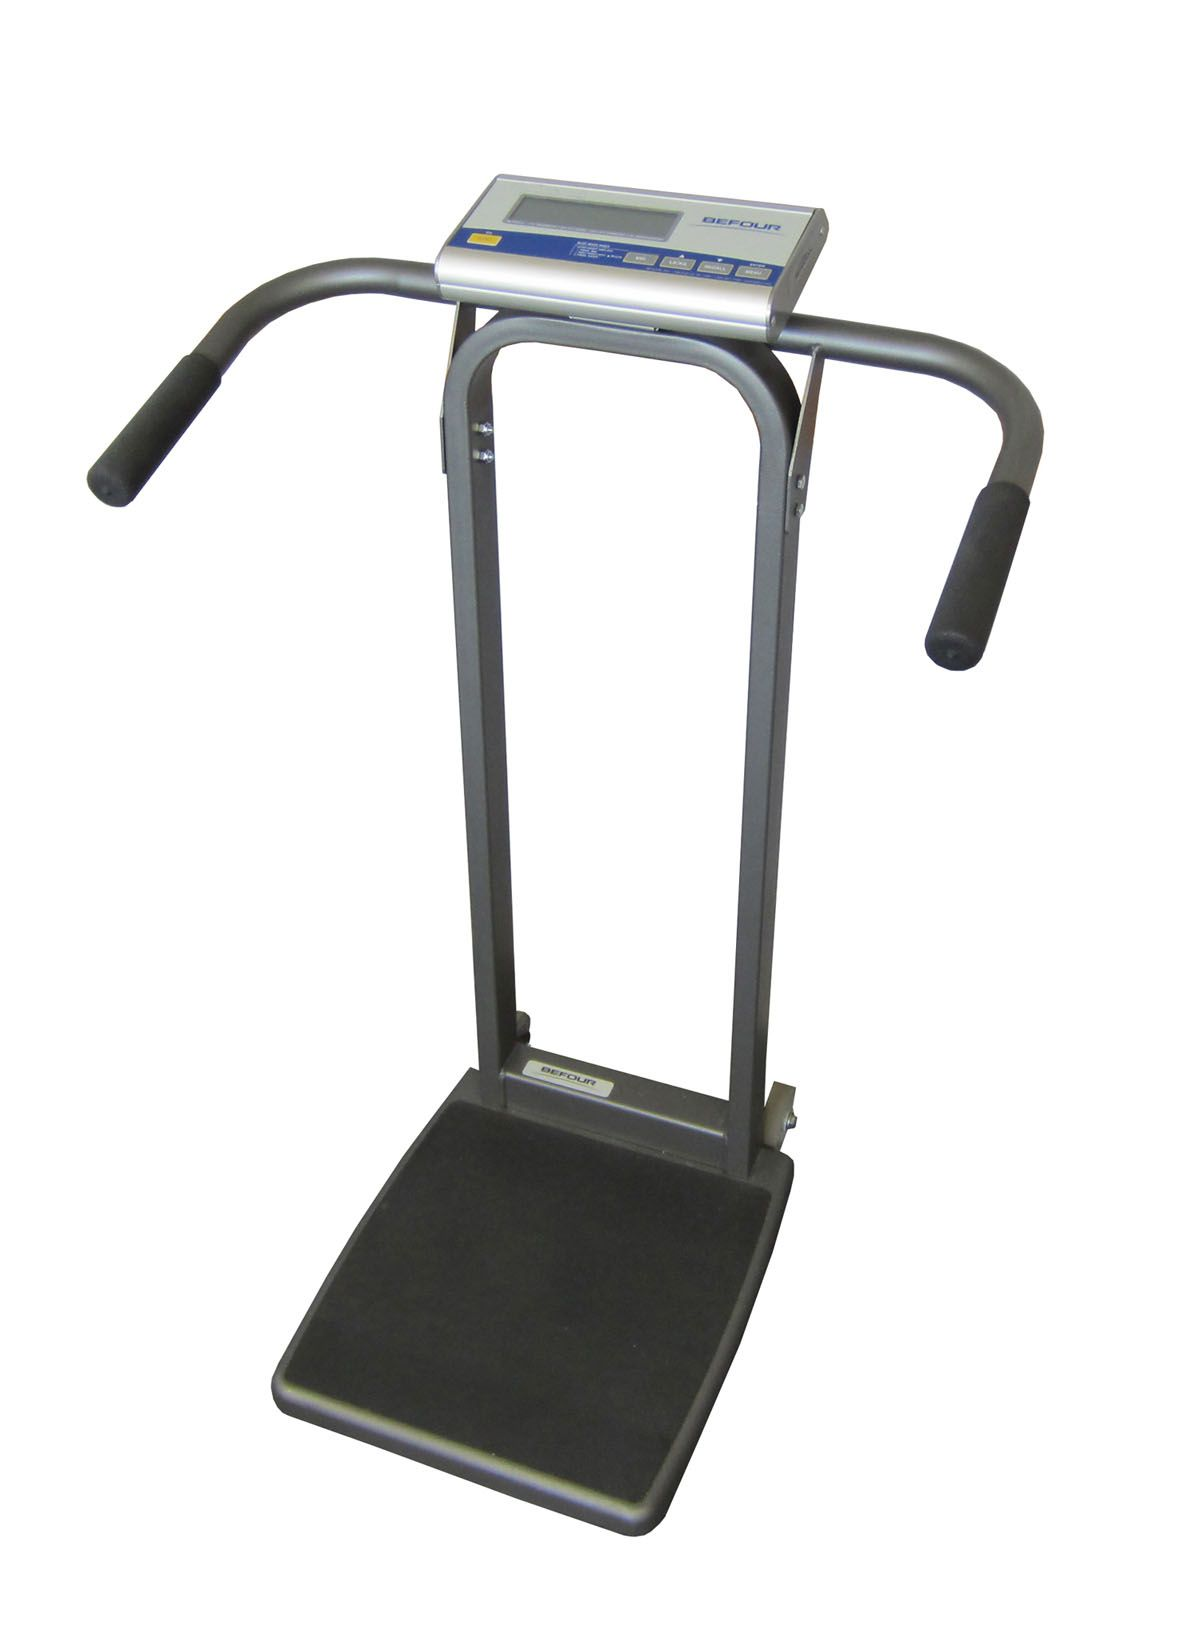 Scale With Handrails : Cardinal scale digital handrail ht rod dgt lb